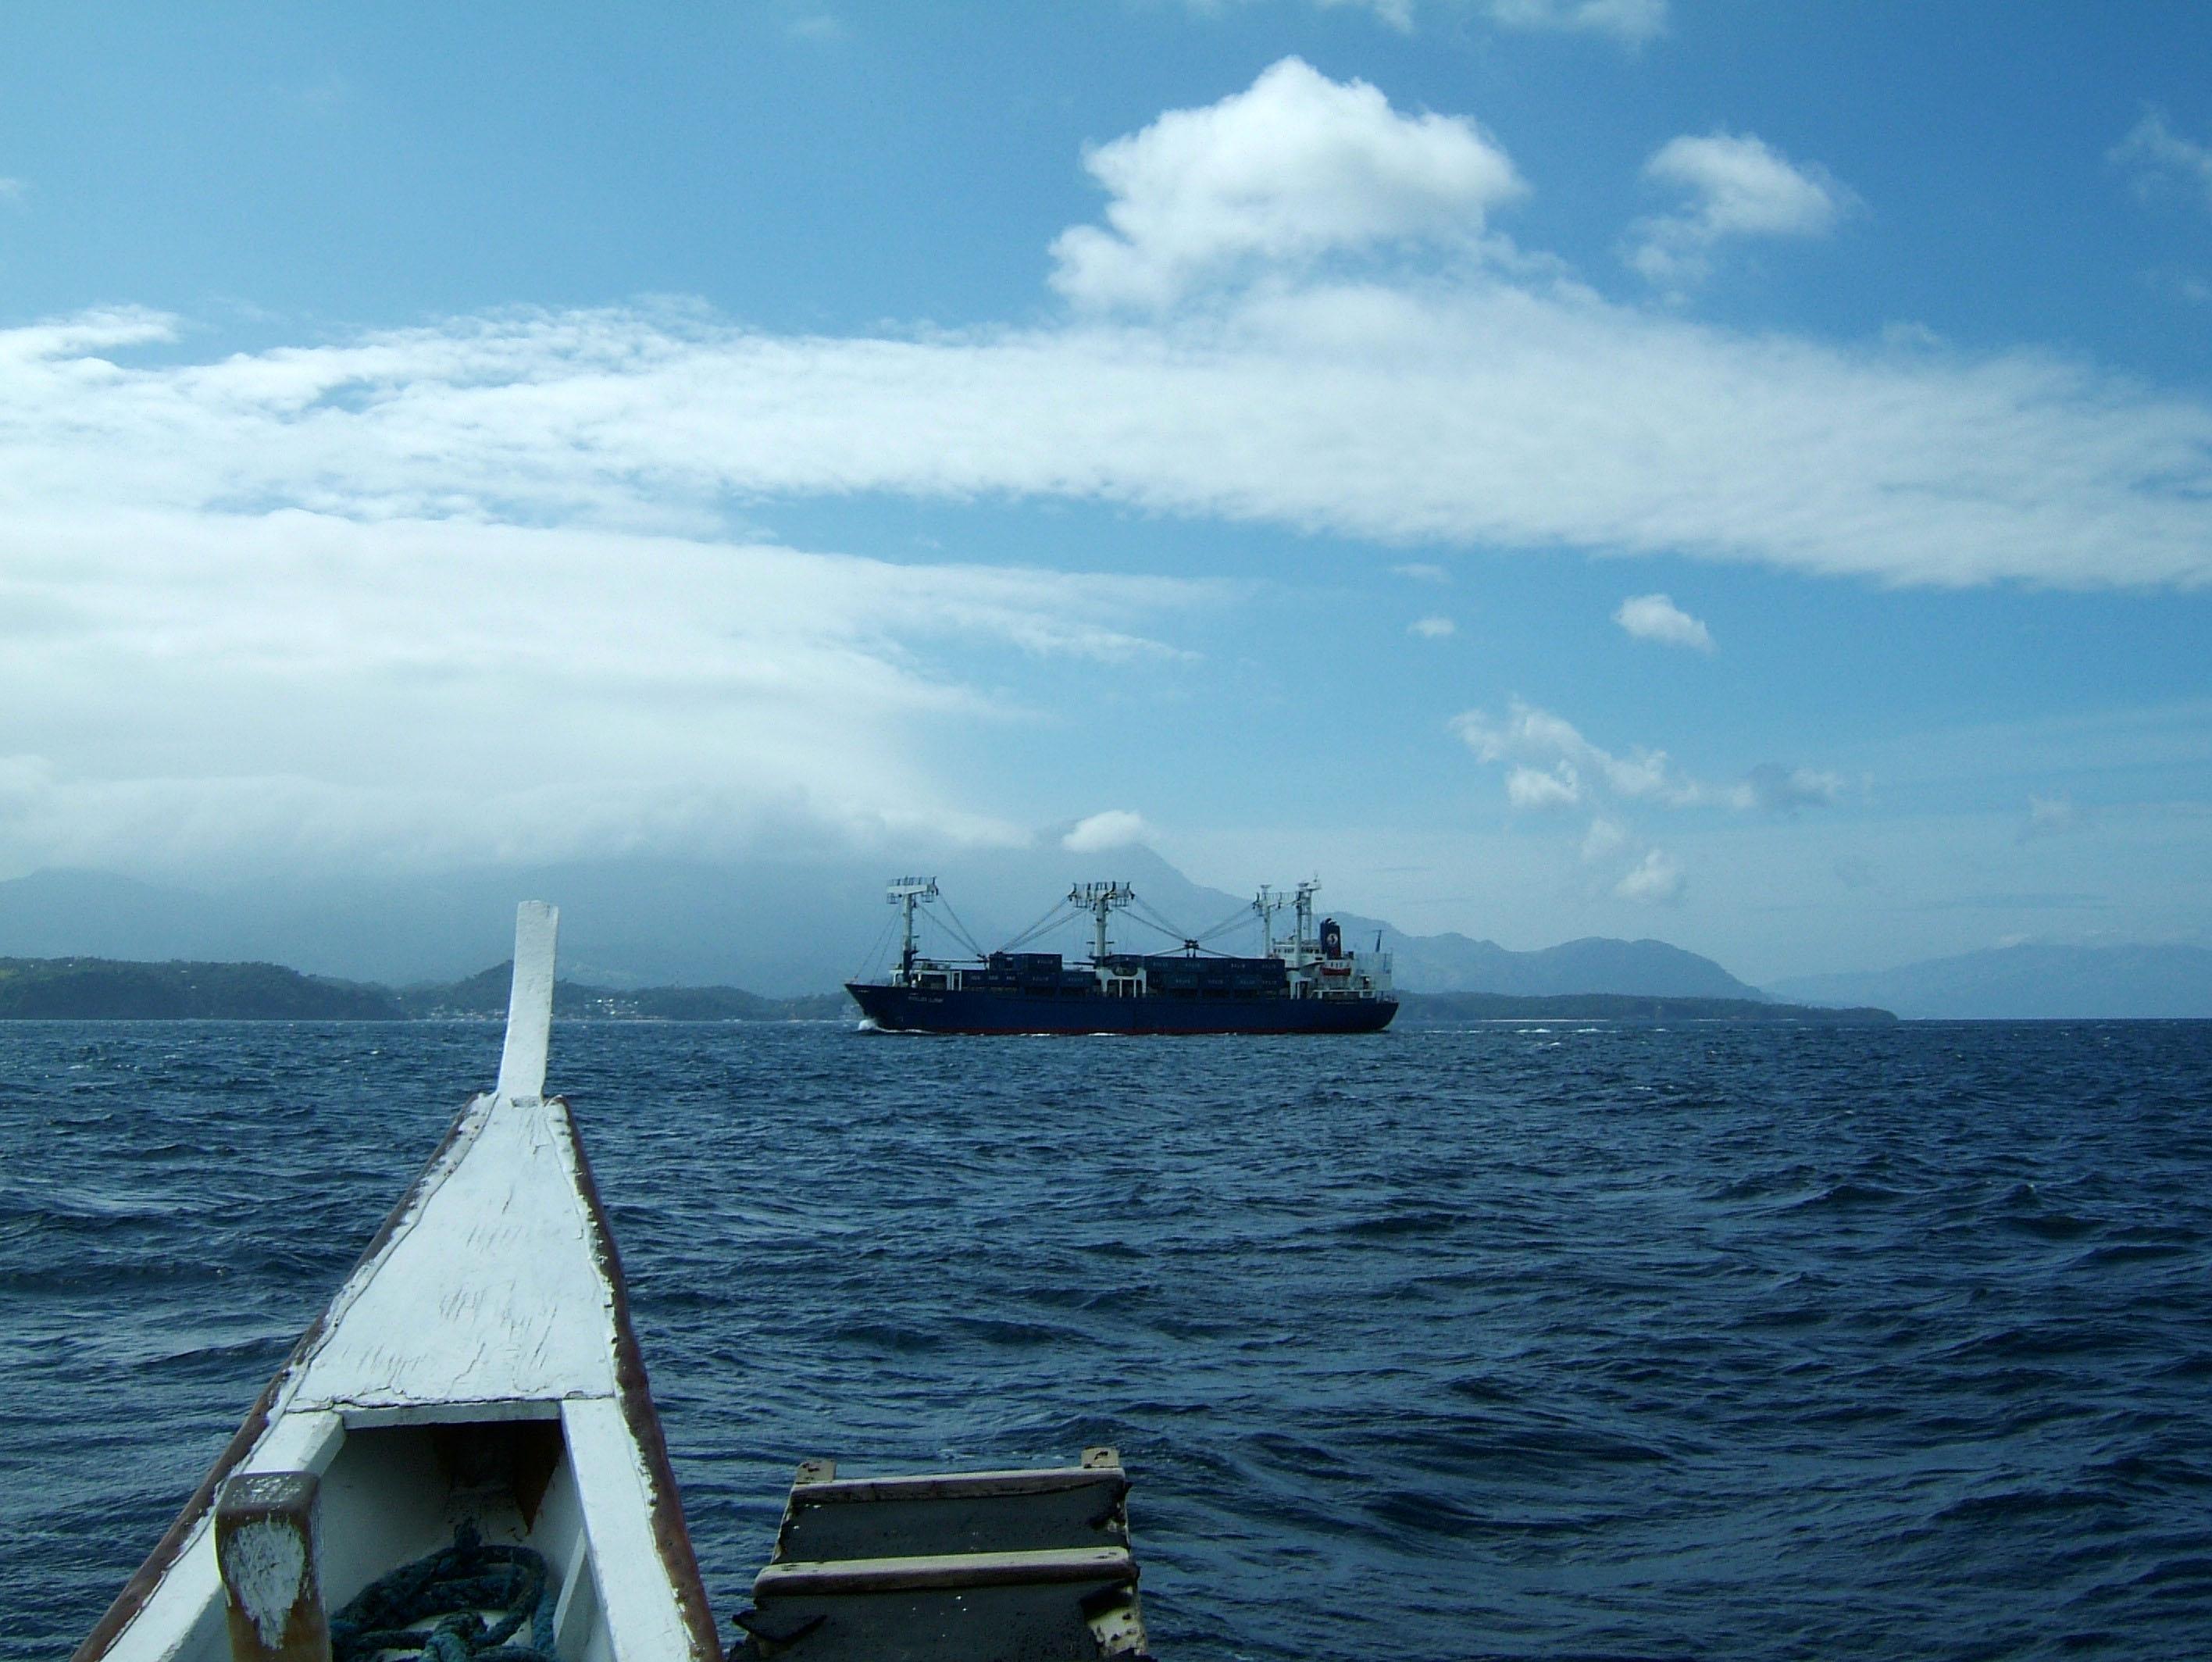 MS Solid Link via Verde Island passage 01